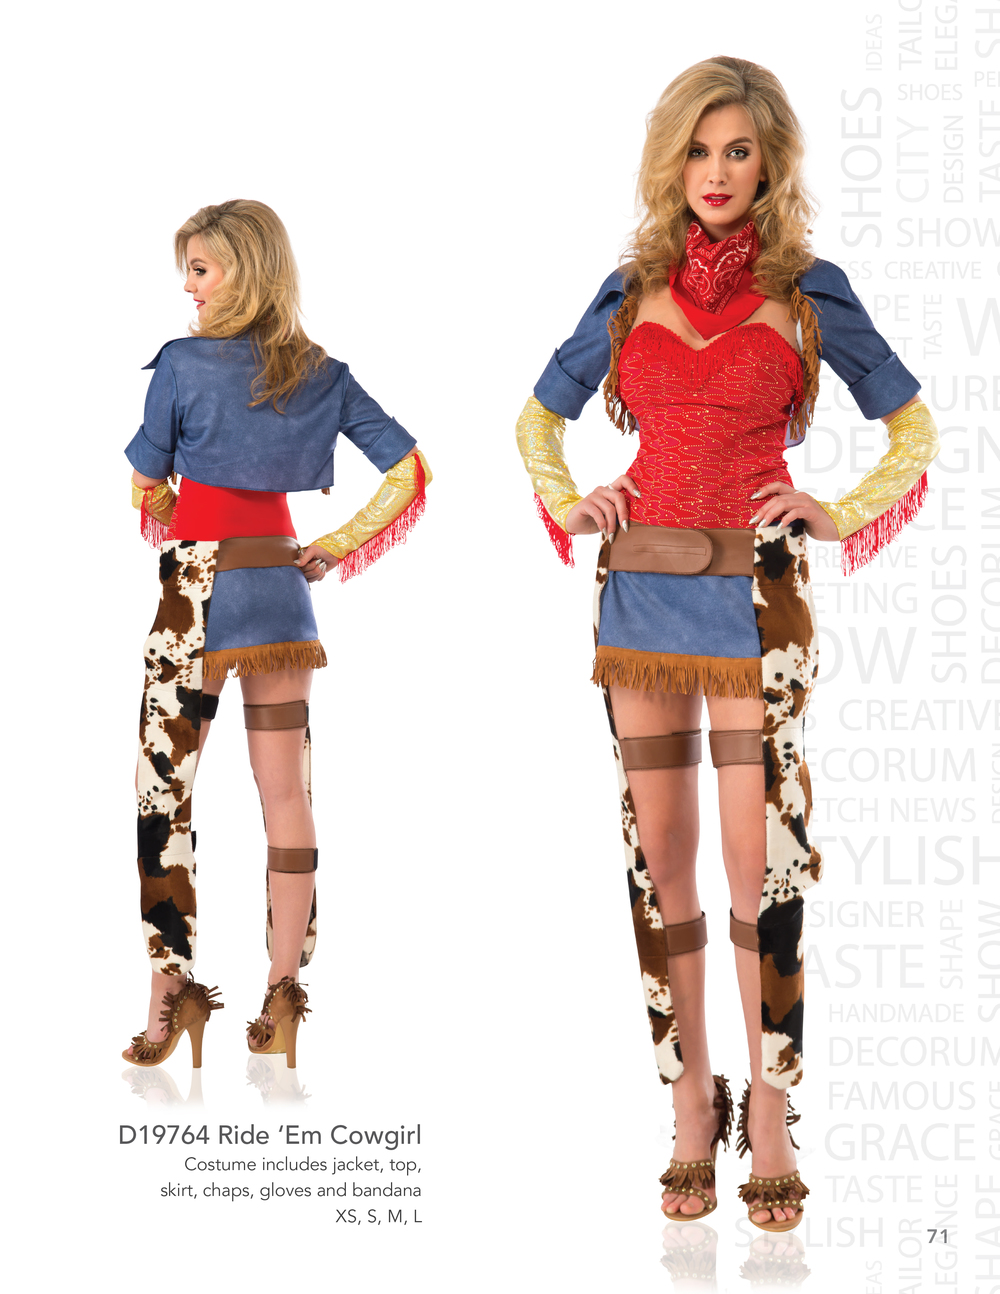 D19764 Ride 'Em Cowgirl